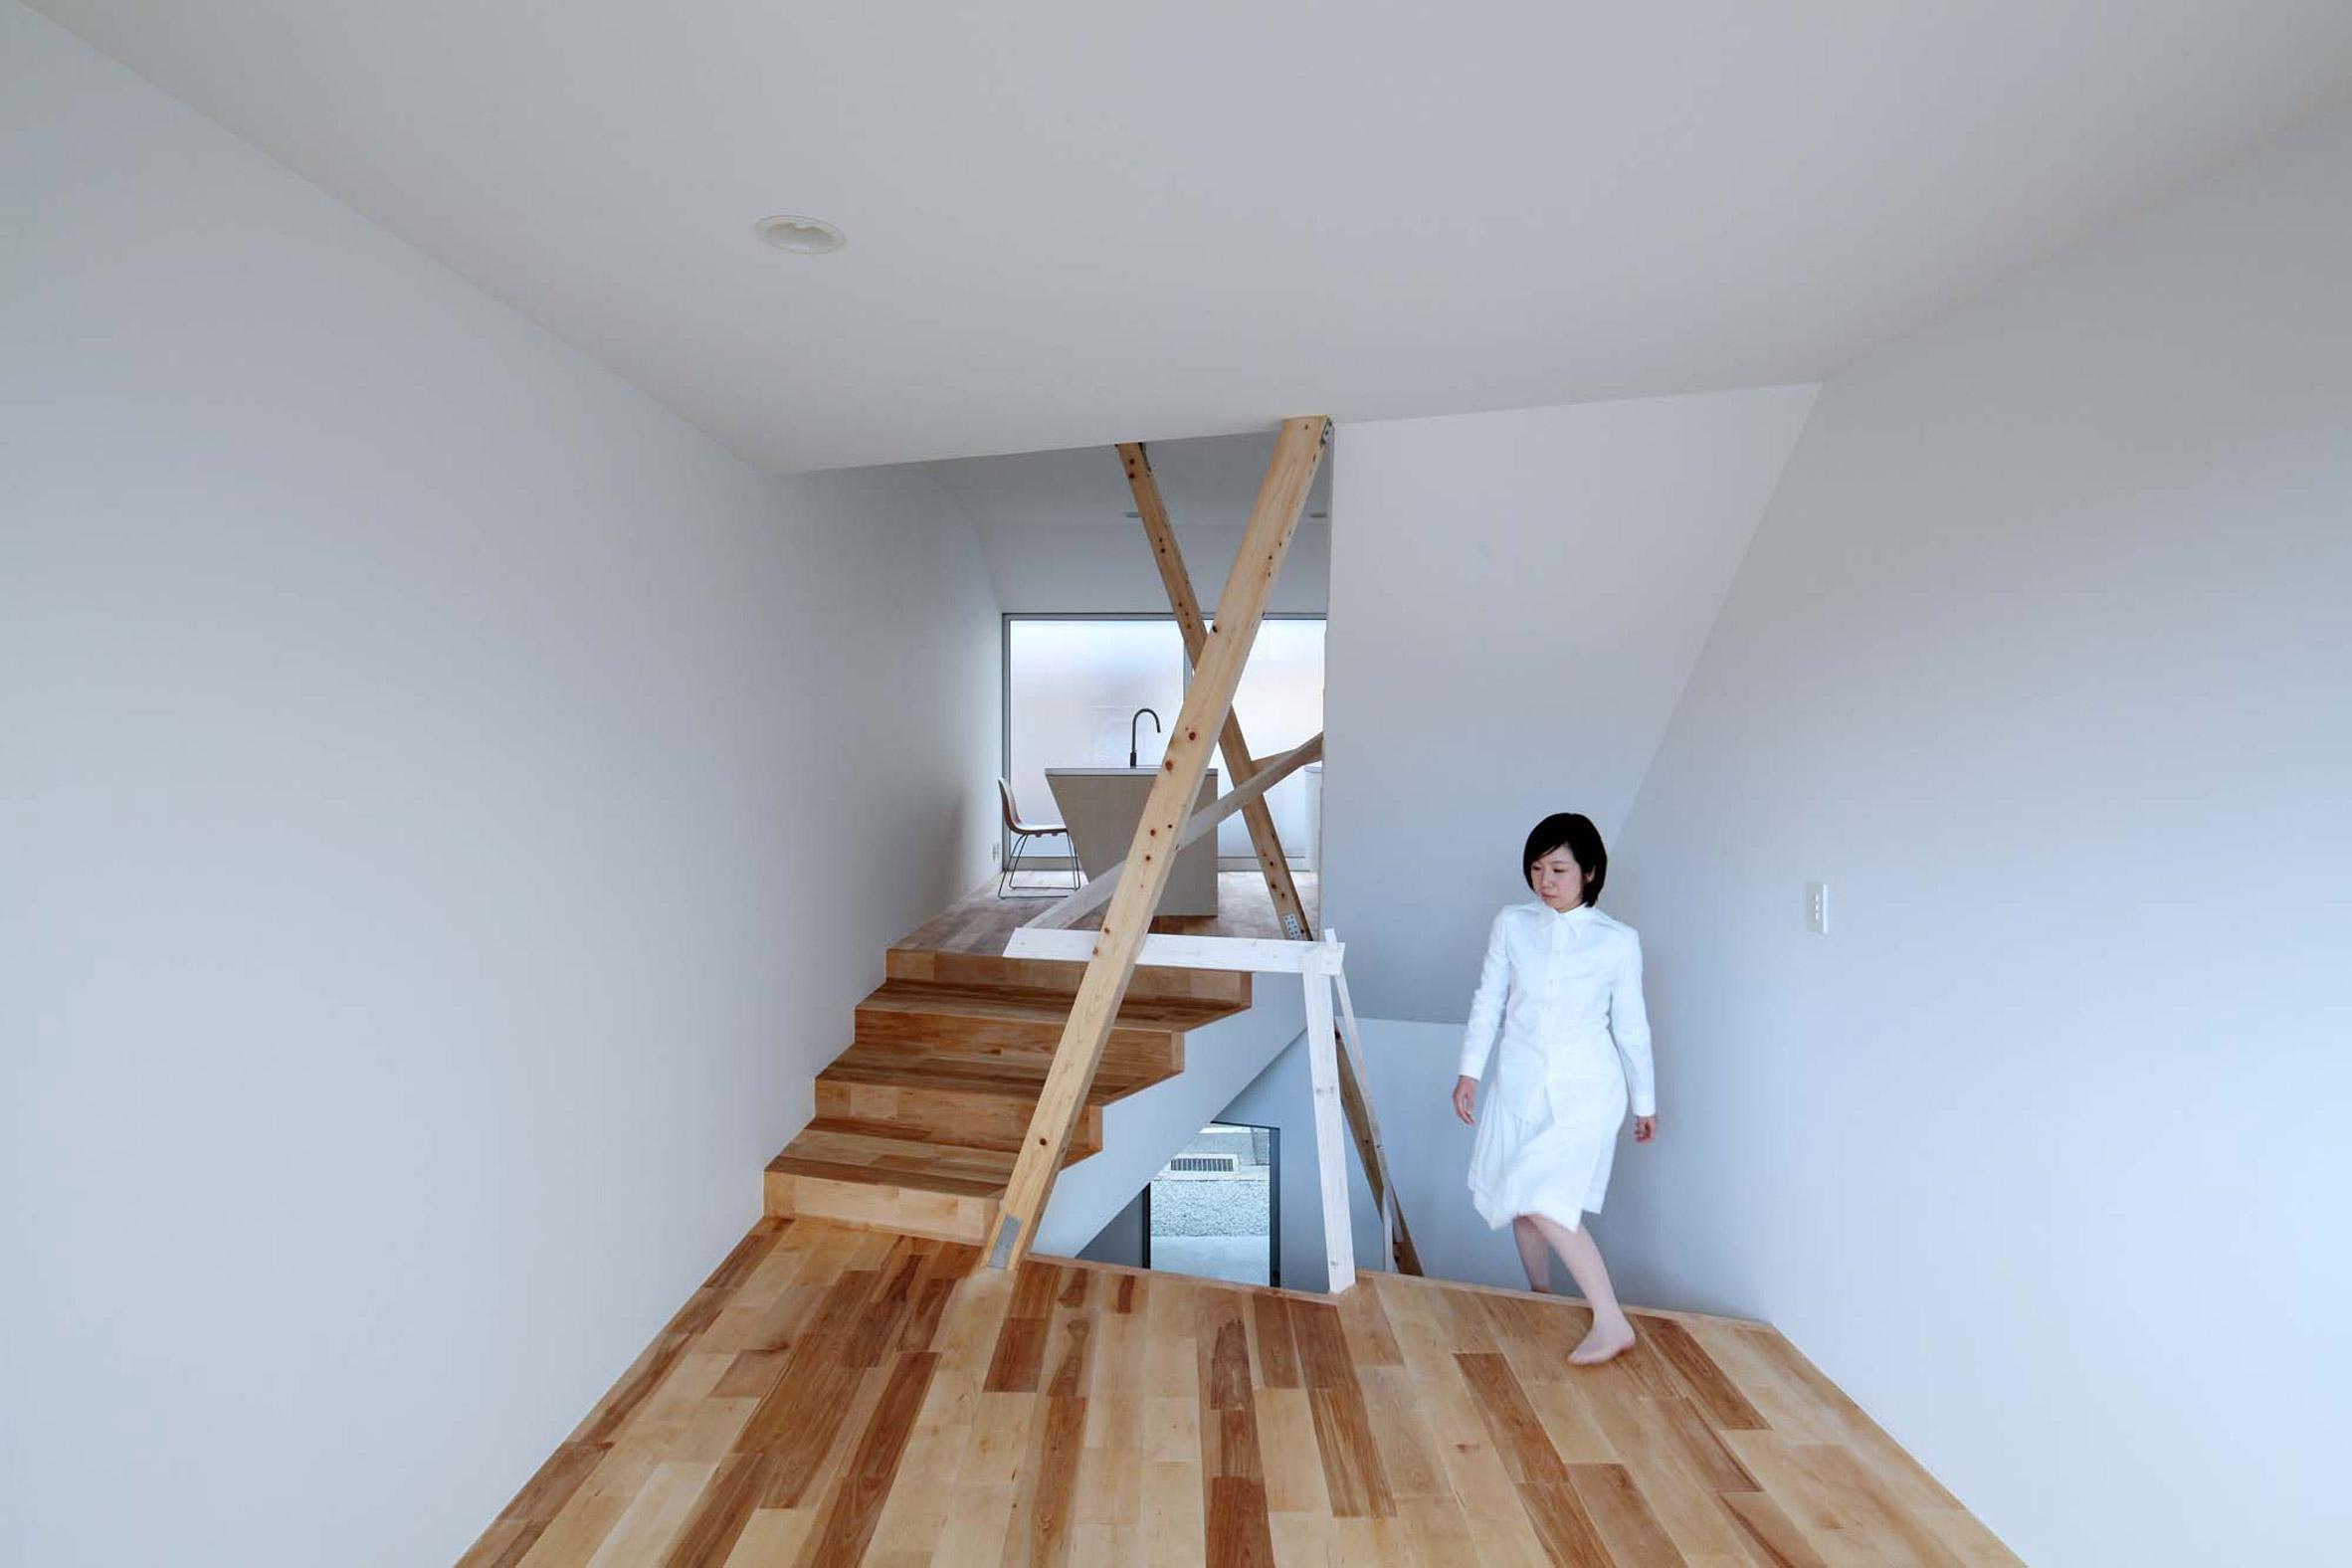 New Kyoto Townhouse 2 by Alphaville Architects